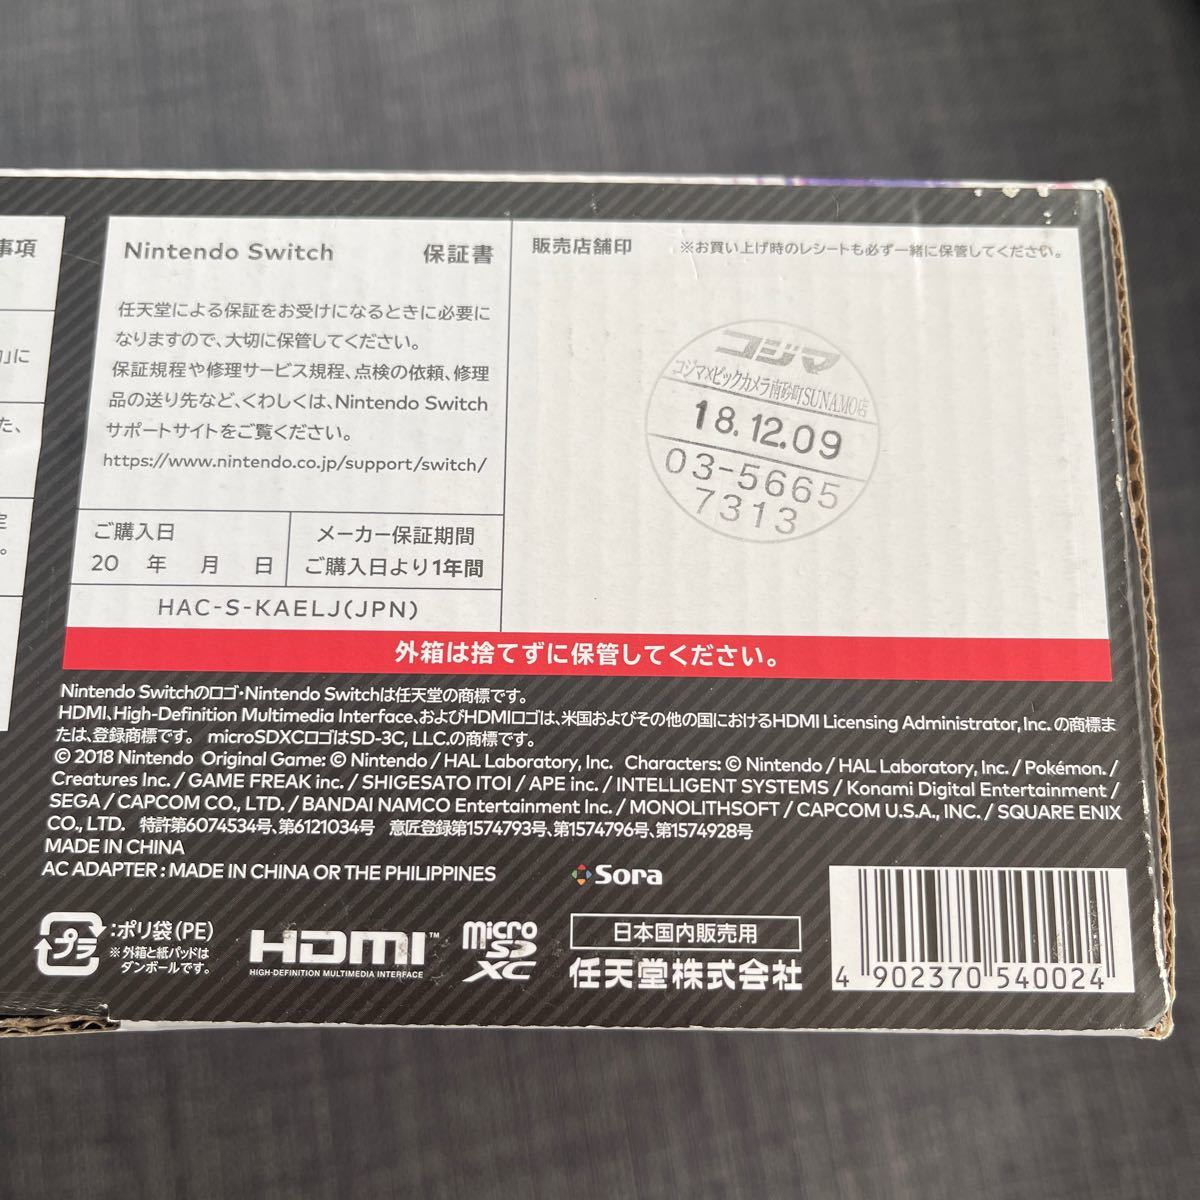 Nintendo Switch NINTENDO SWITCH タイラントウ スマッシュフラサース SPECIALセット